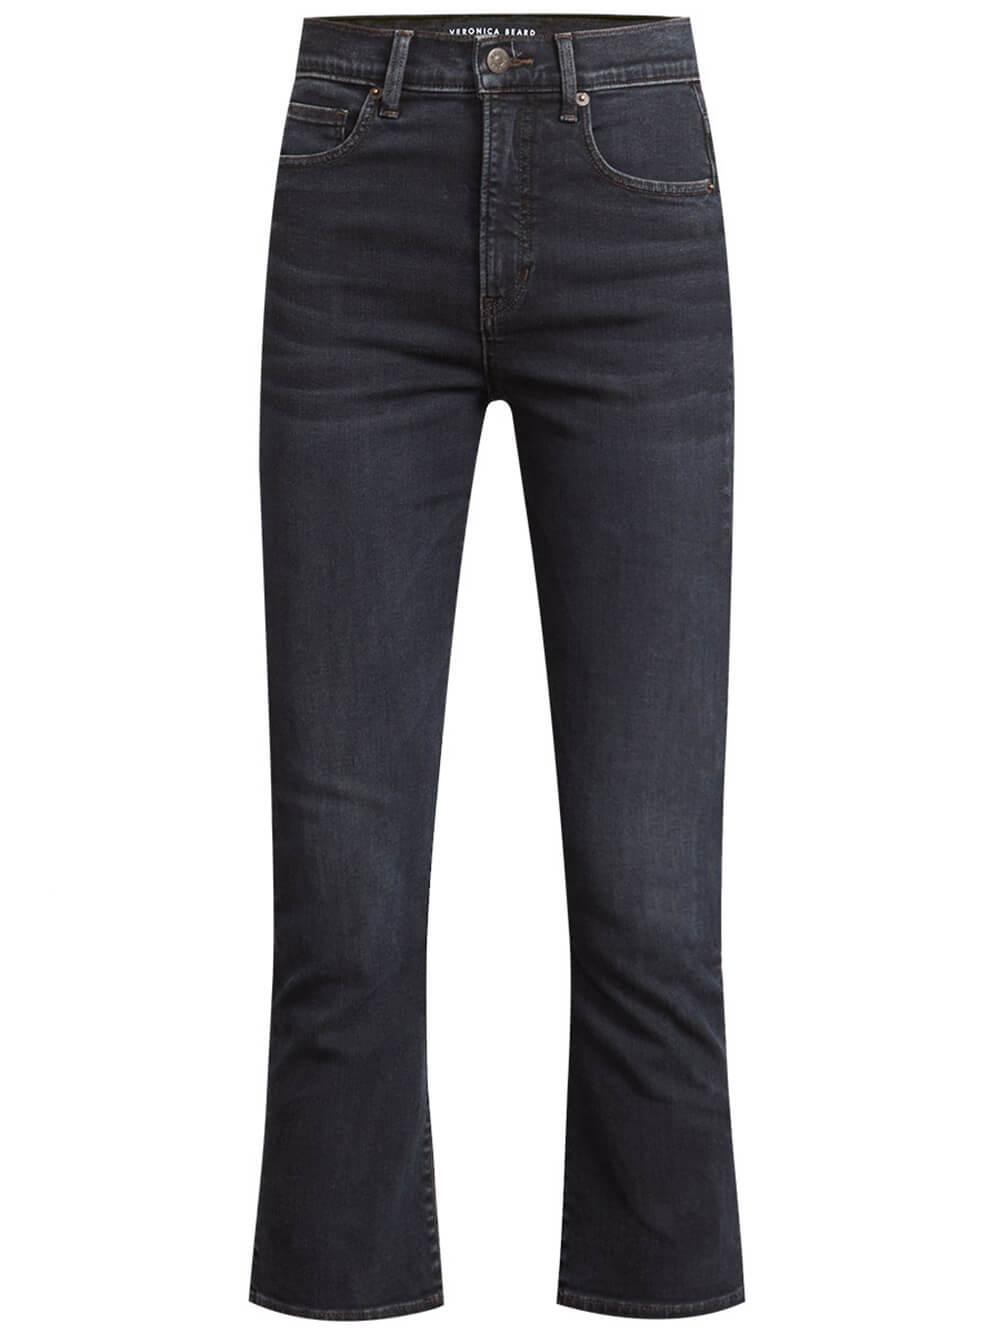 Carly High Rise Kick Flare Jeans Item # J21082820276DI